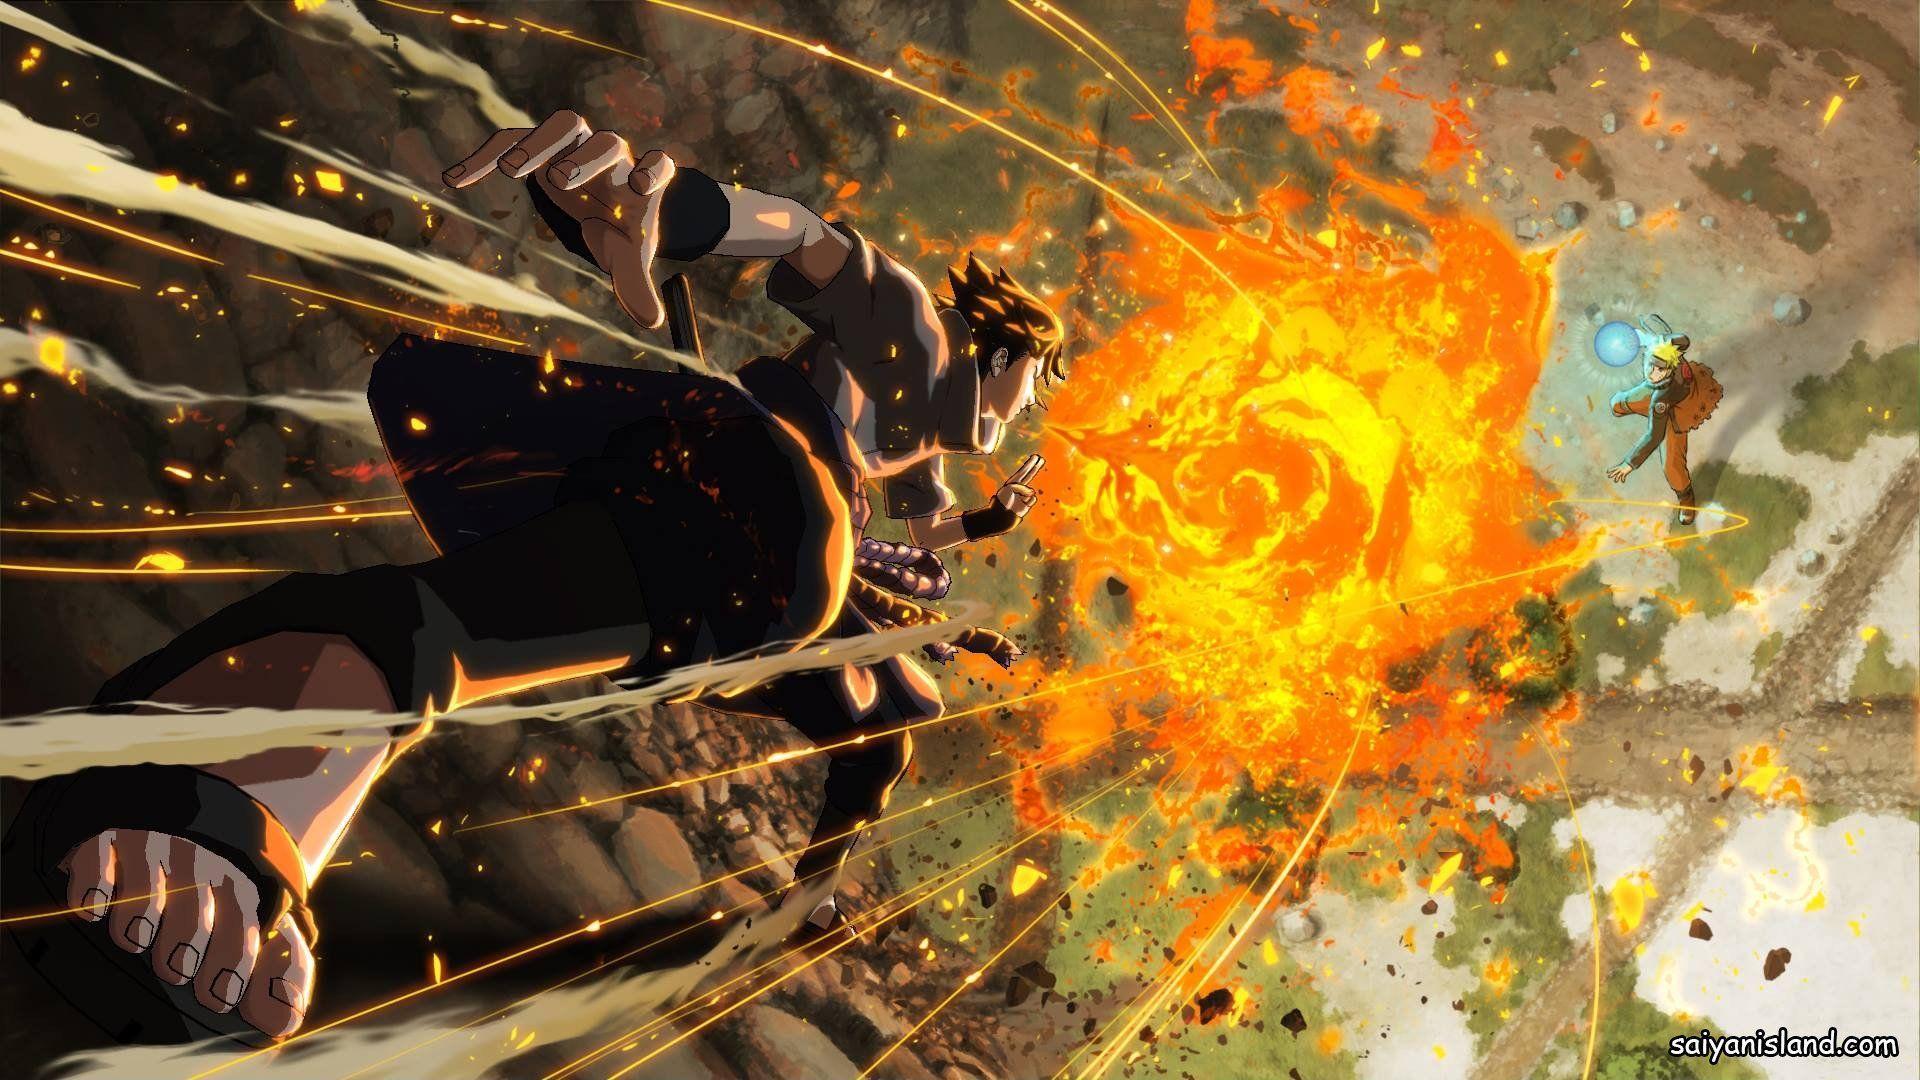 Naruto Shippuden: Ultimate Ninja Storm 4 Wallpapers